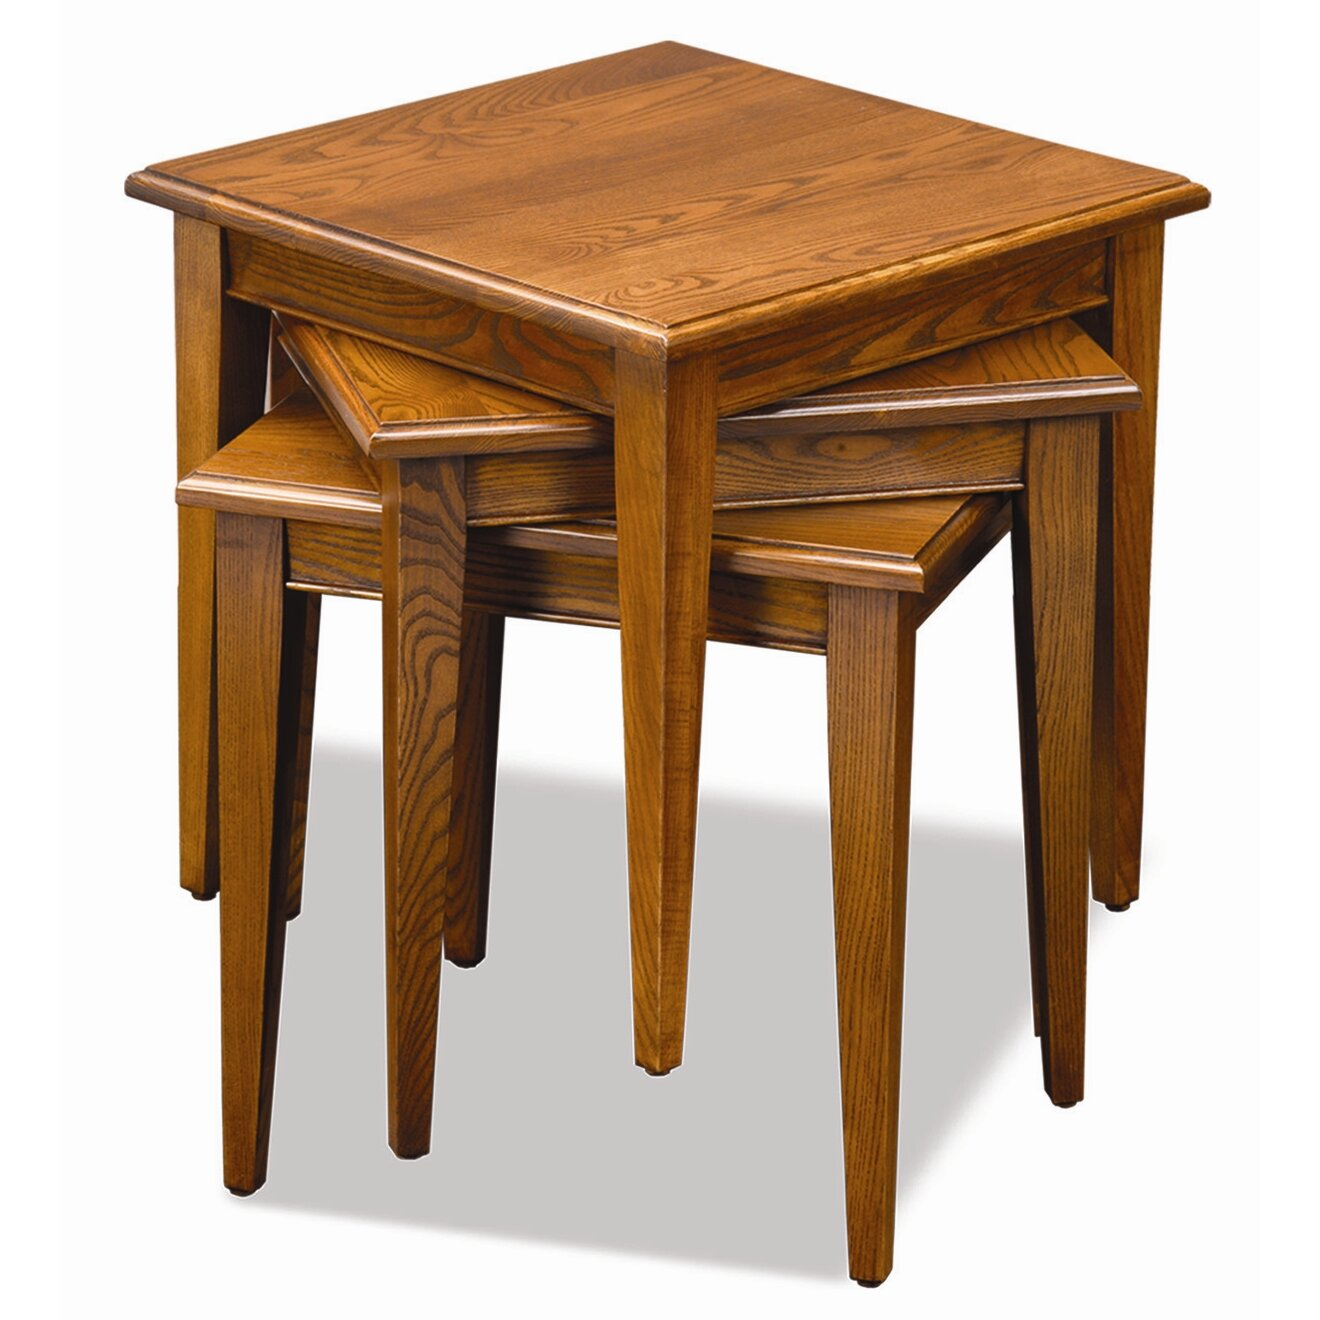 Leick 3 Piece Nesting Tables & Reviews | Wayfair.ca